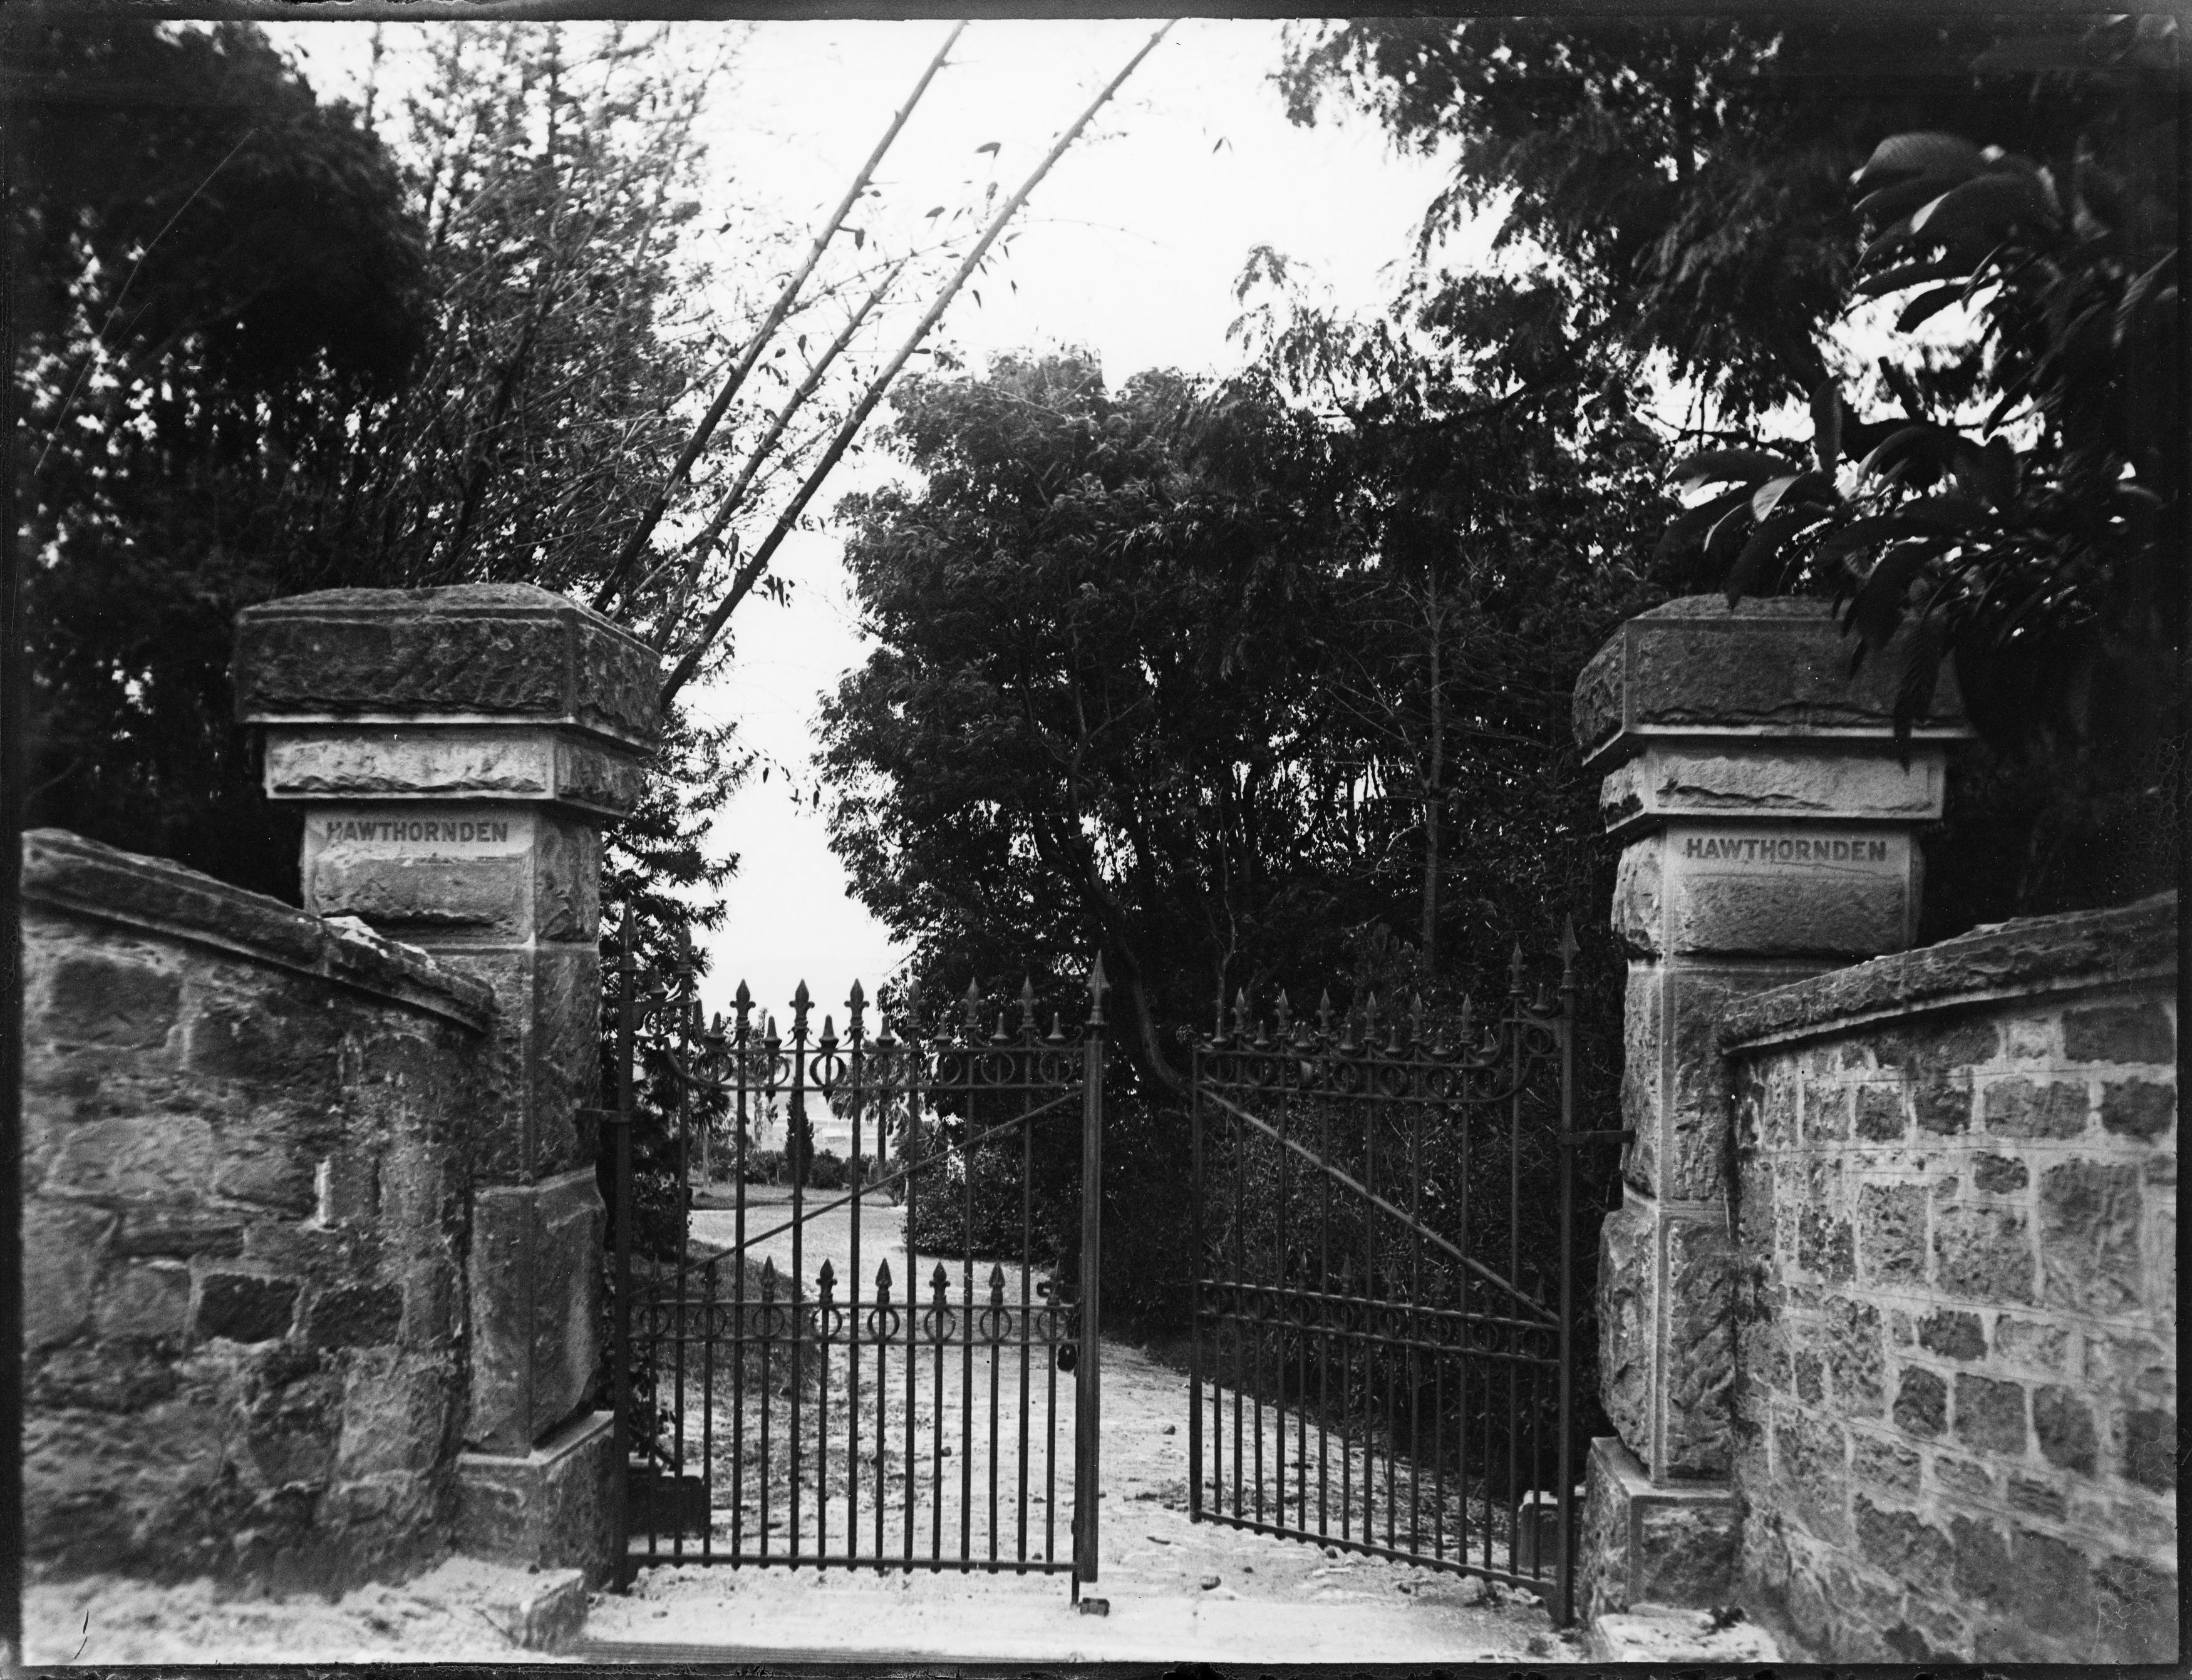 Sandstone entry gates to Hawthornden, 6 Roslyndale Road, Edgecliff